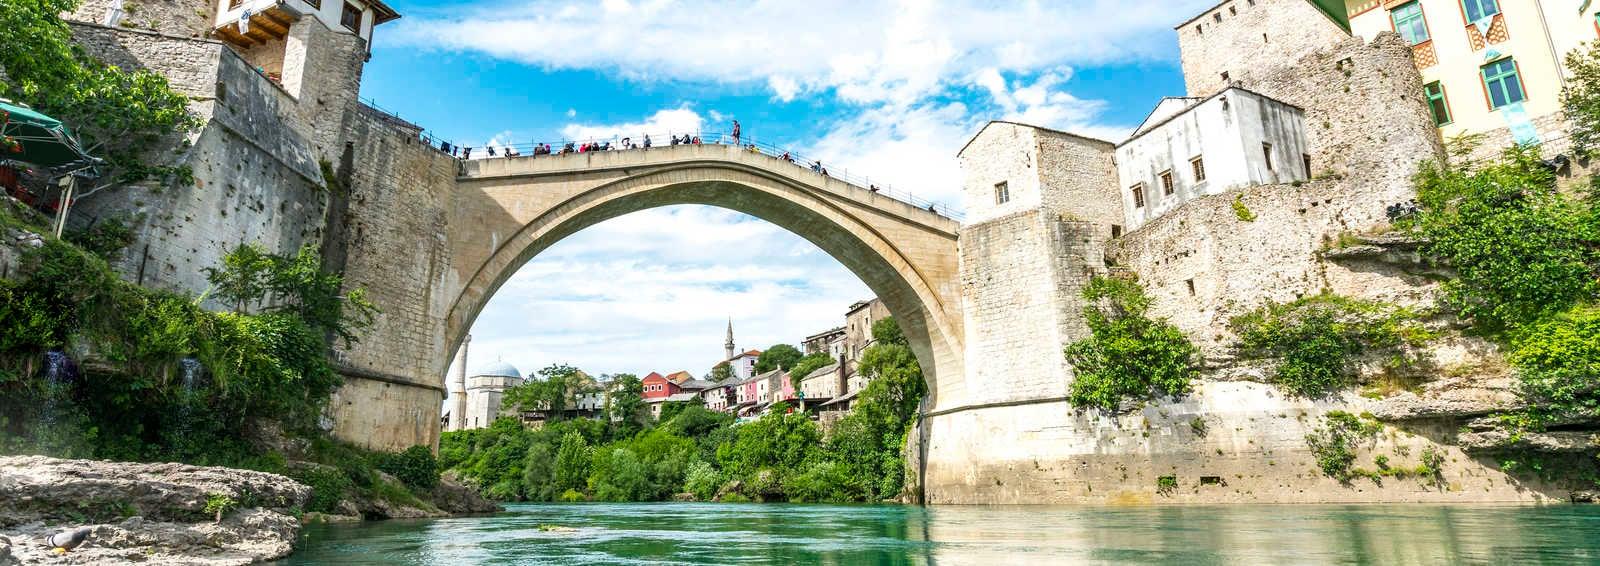 Stari Most, Mostar, Bosnia & Herzegovina